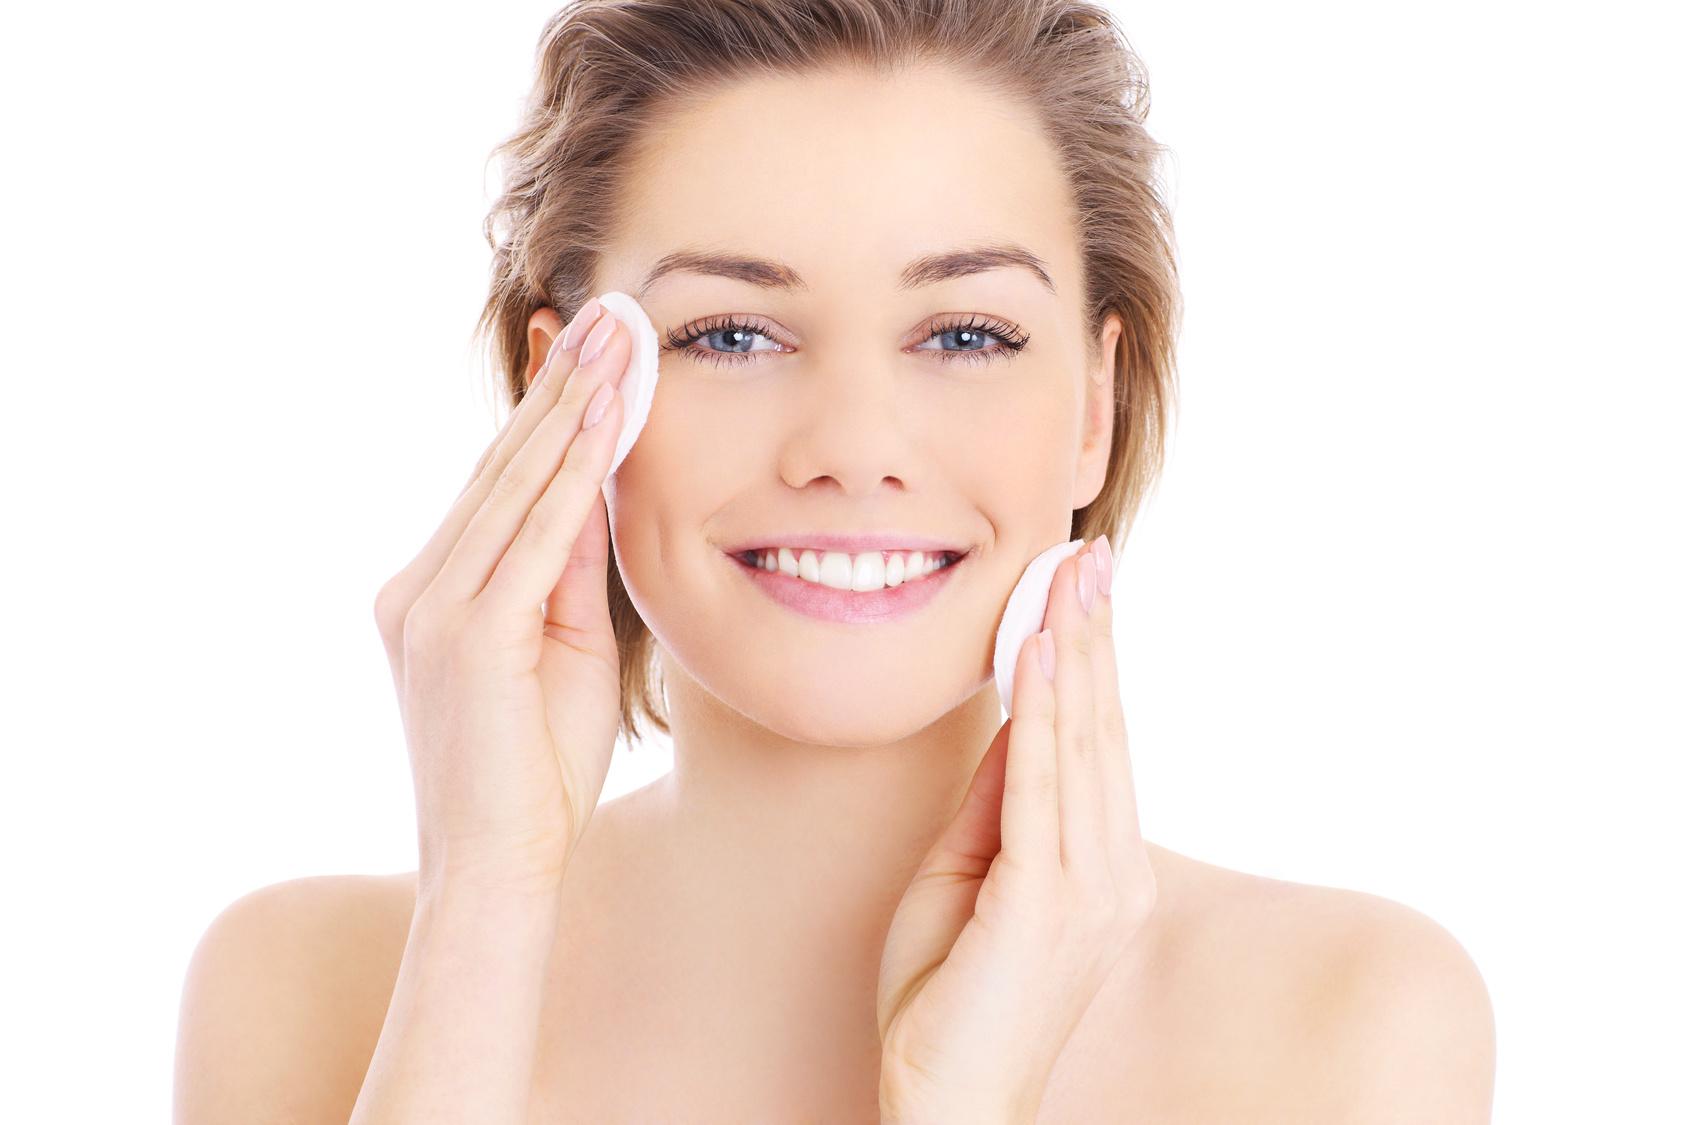 jak oczyścić skórę twarzy?